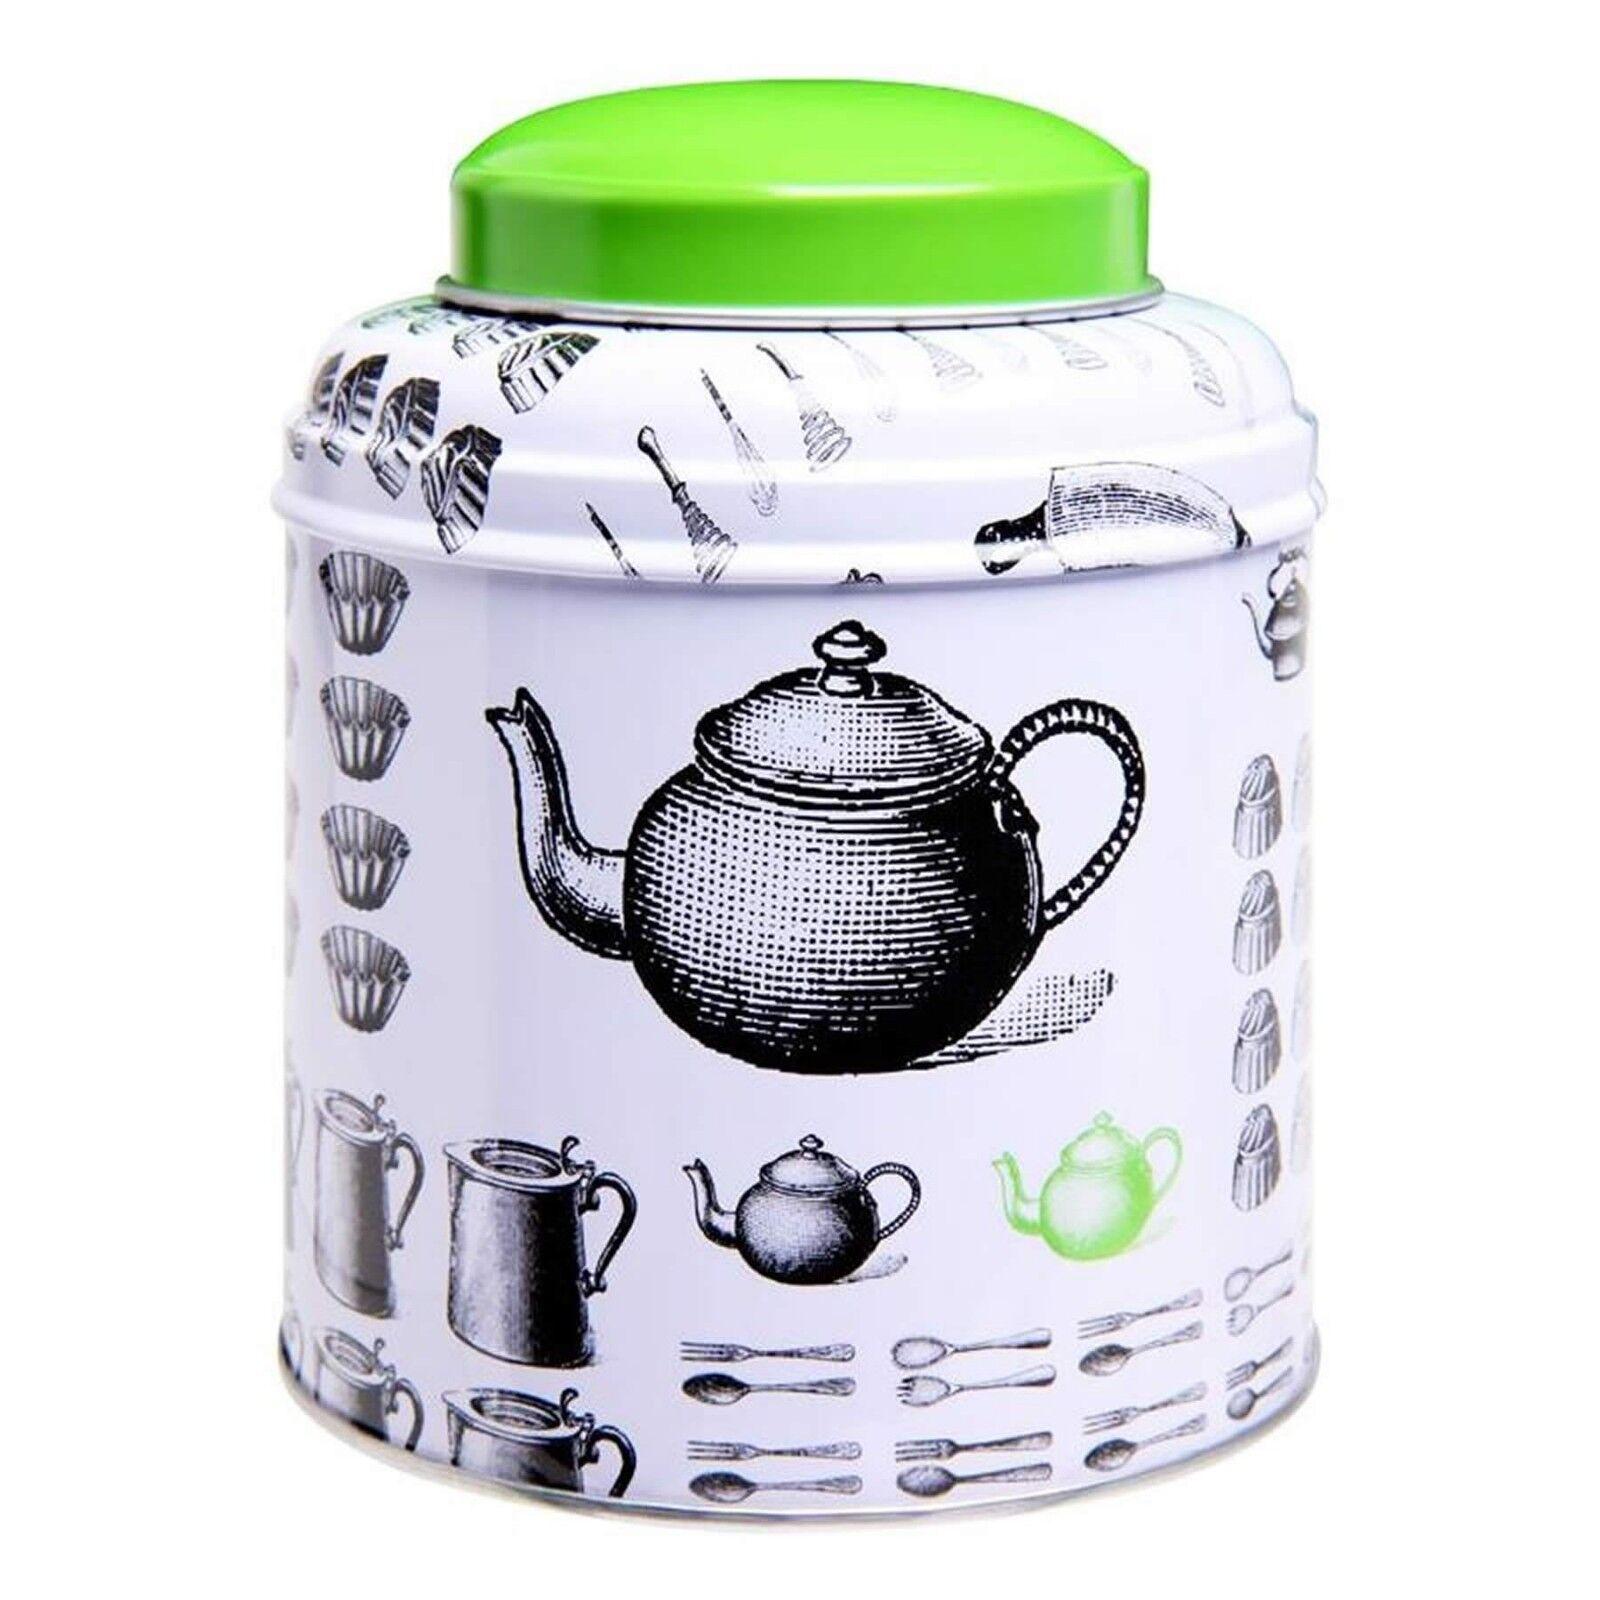 Virojanglor Kitchen Storage Tins Biscuit Bread Tea Coffee Pasta Canisters VJ